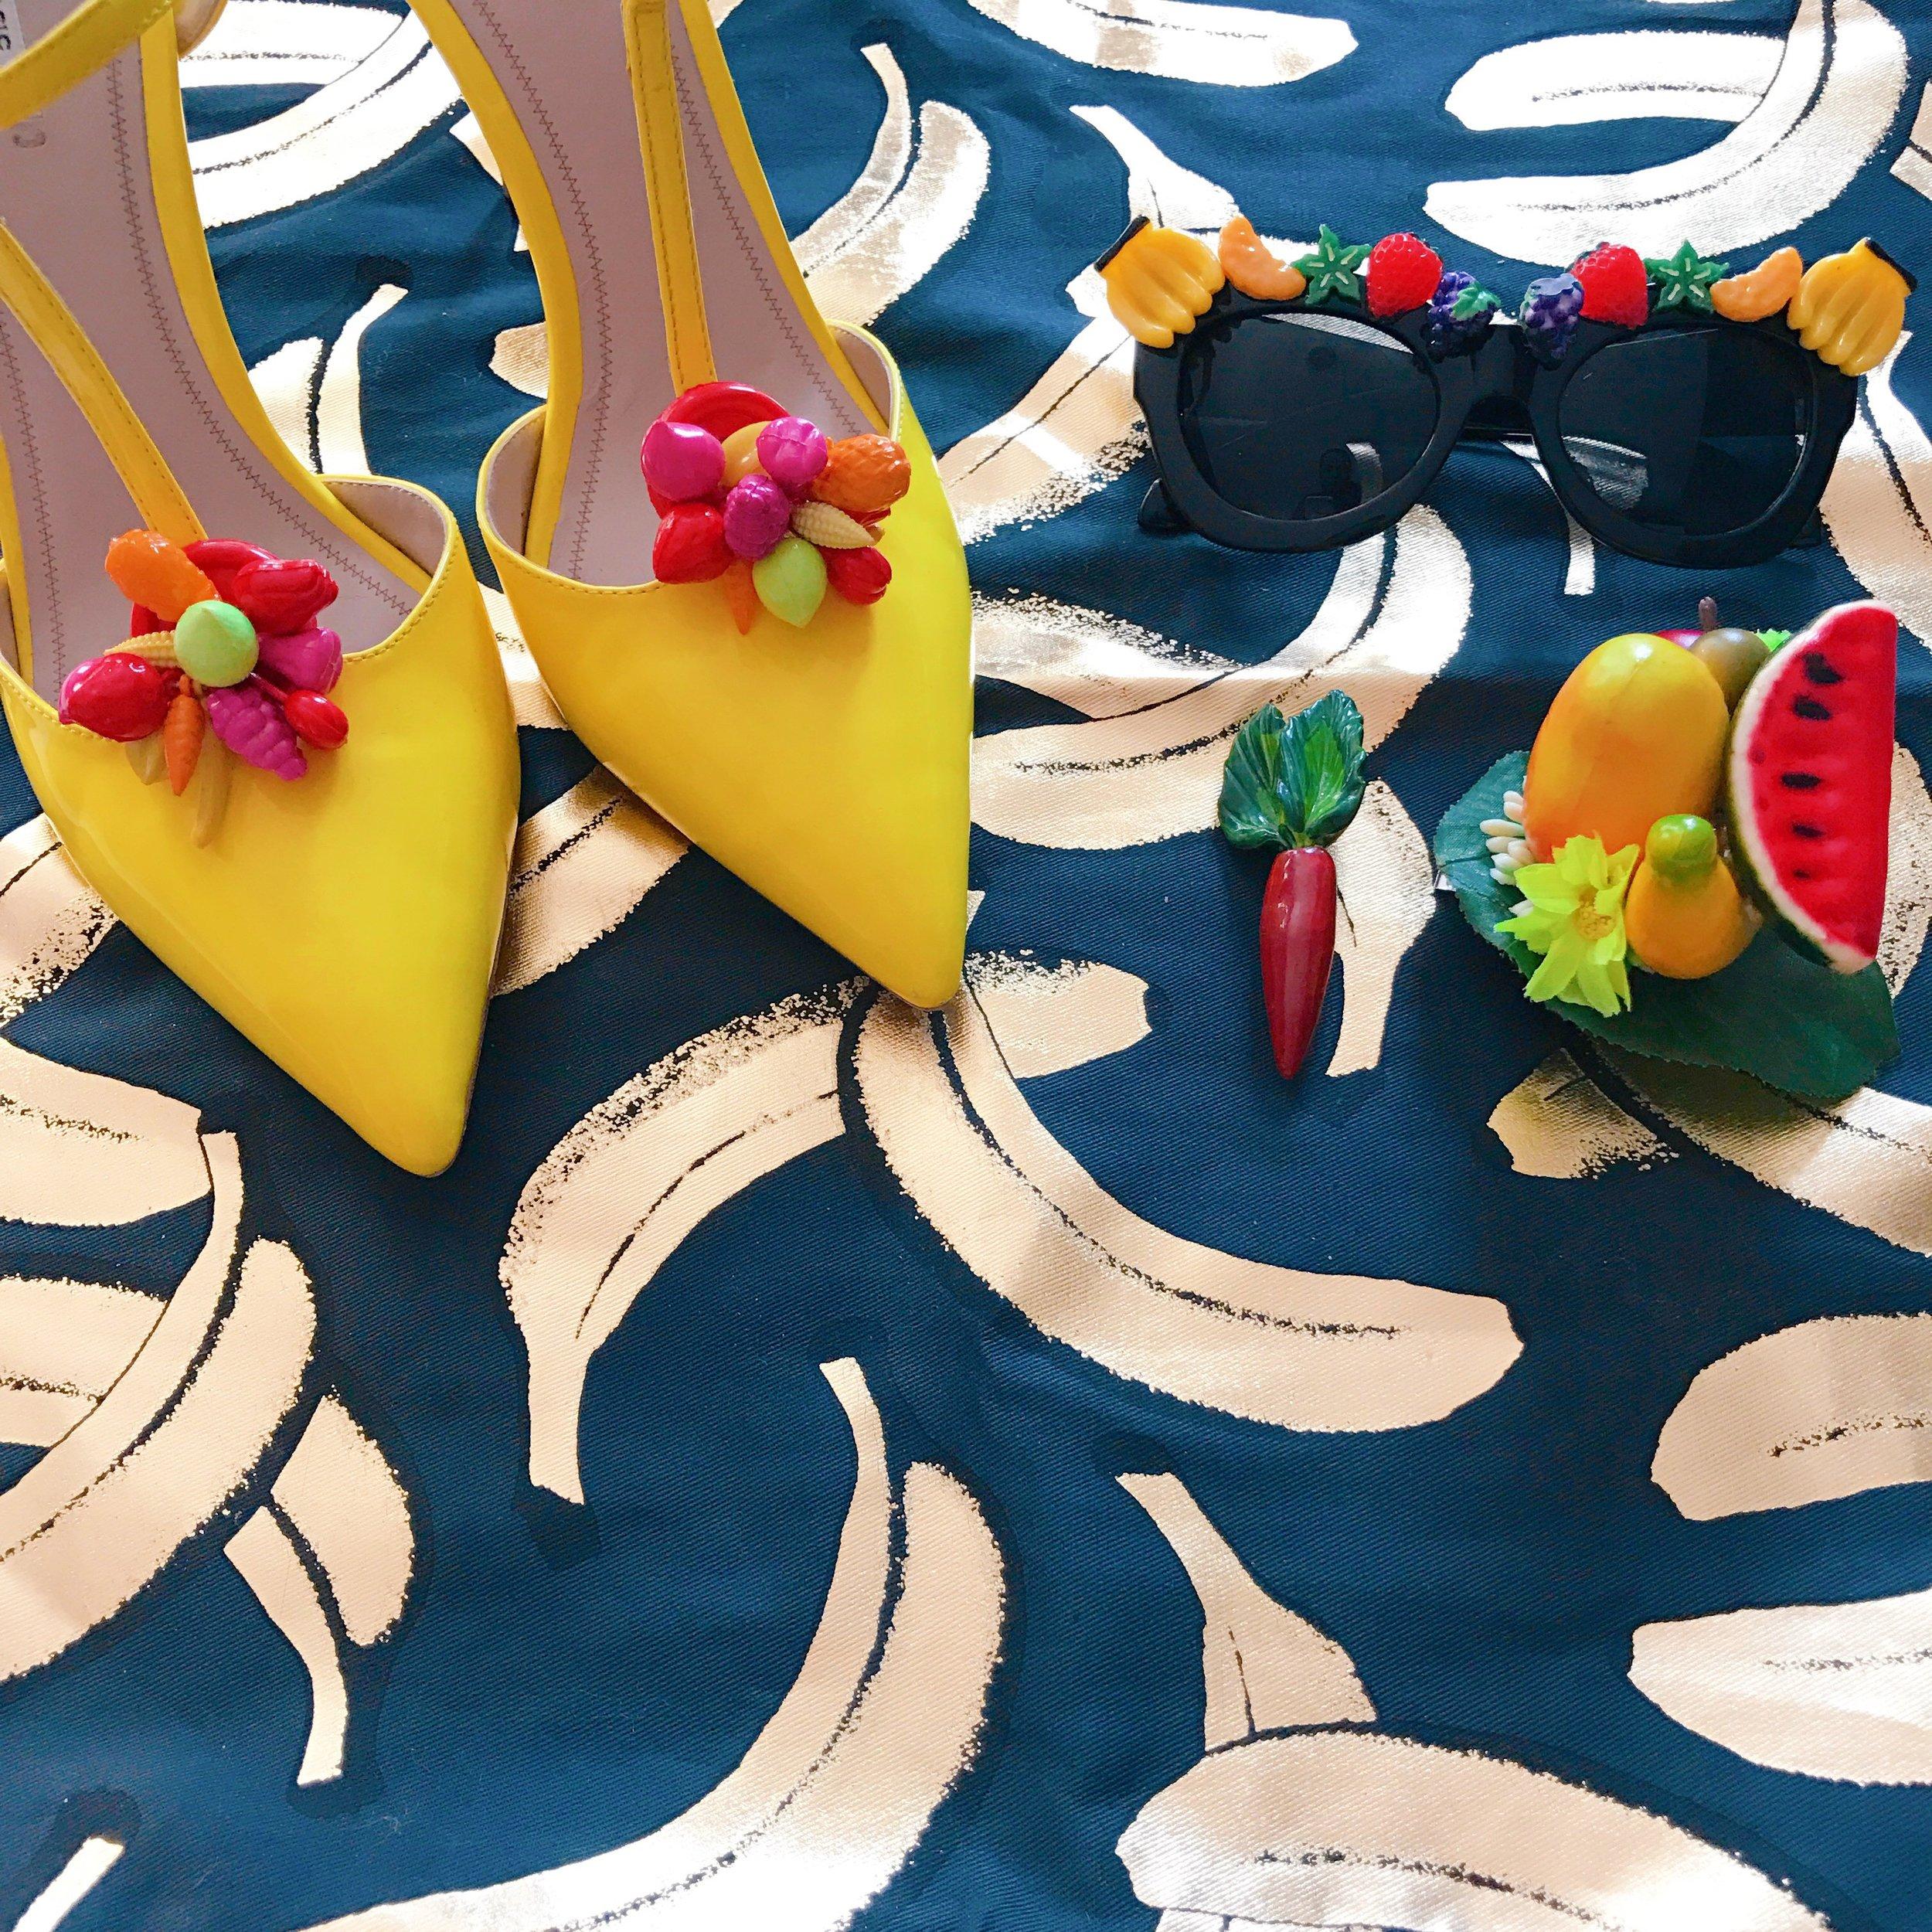 DIY Tutti-Frutti sunnies,  DIY fruit heels (coming soon), tropical fruit pinup hair accessory, Mom's vintage carrot brooch